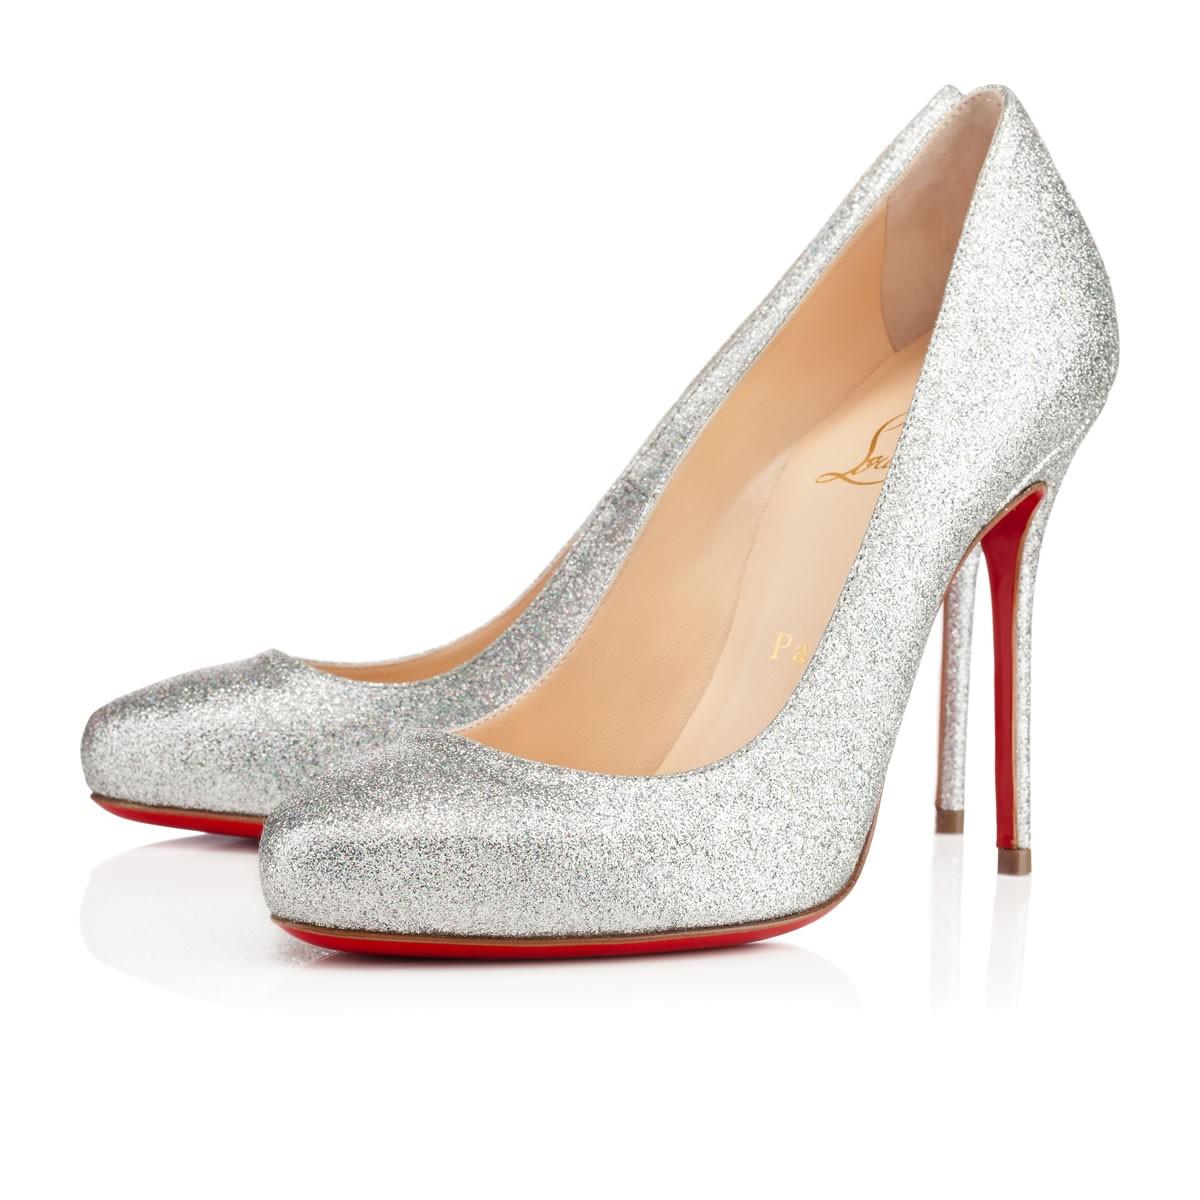 sears bridal shoes photo - 1